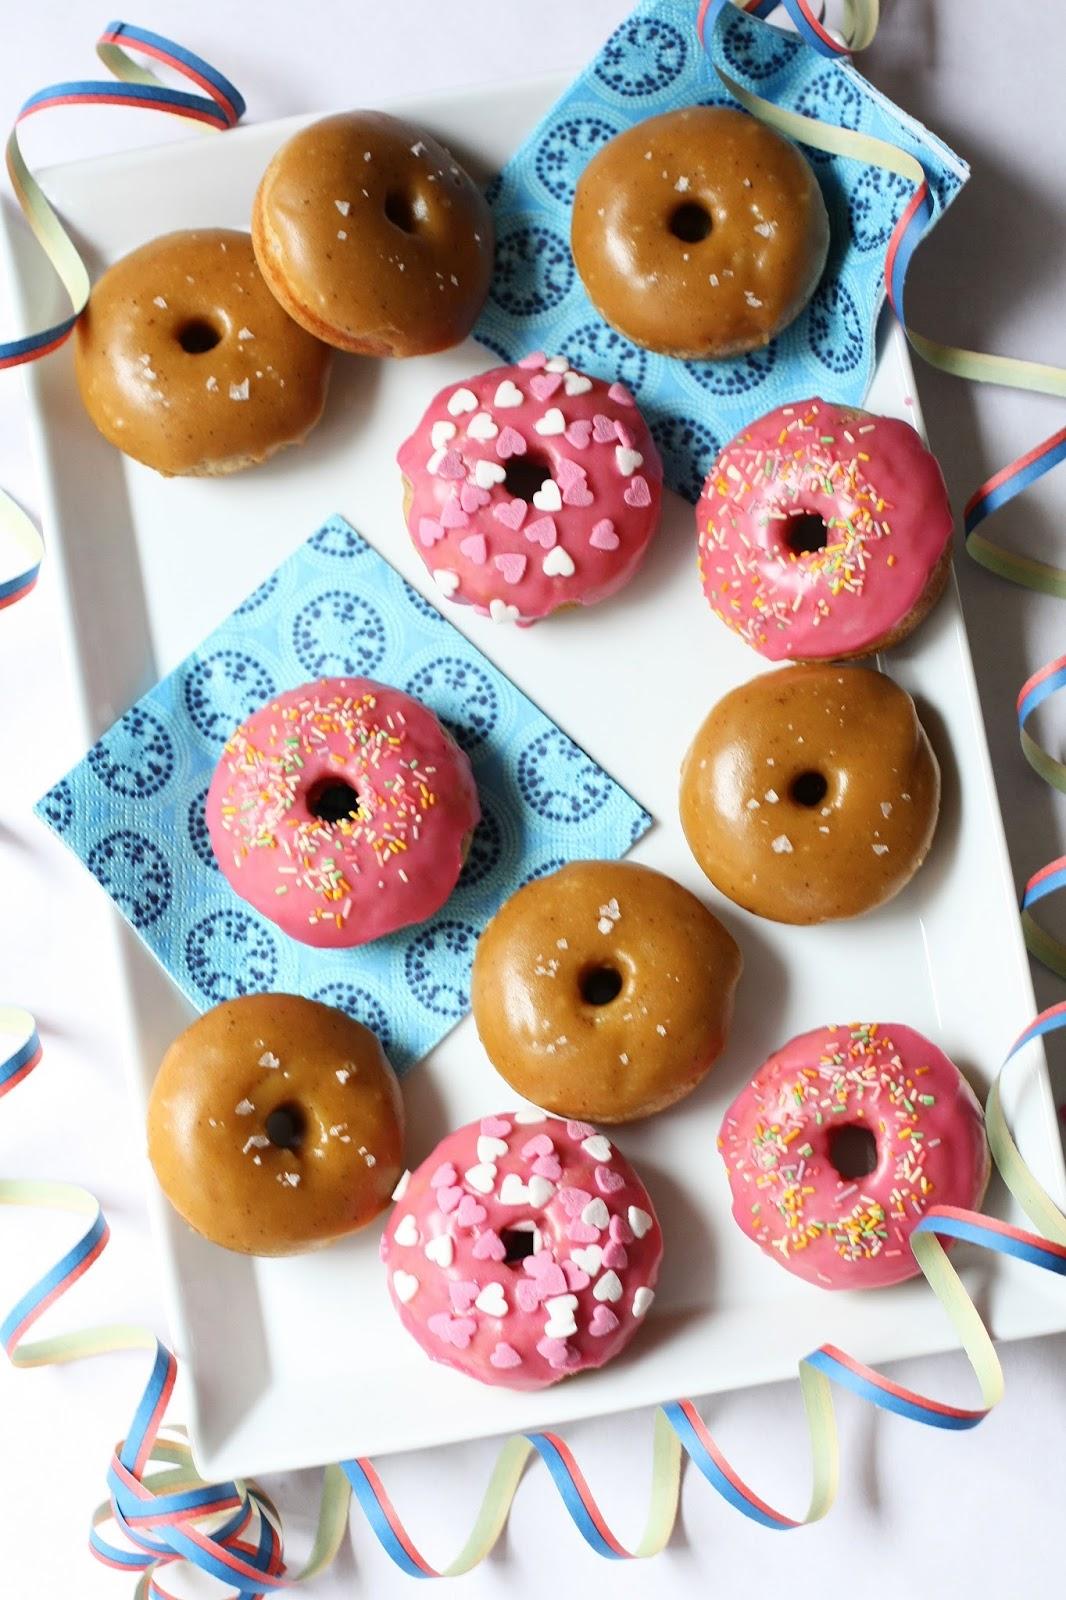 vaaleanpunaiset vappudonitsit donitsit uunidonitsit vappu pomada mallaspulla resepti